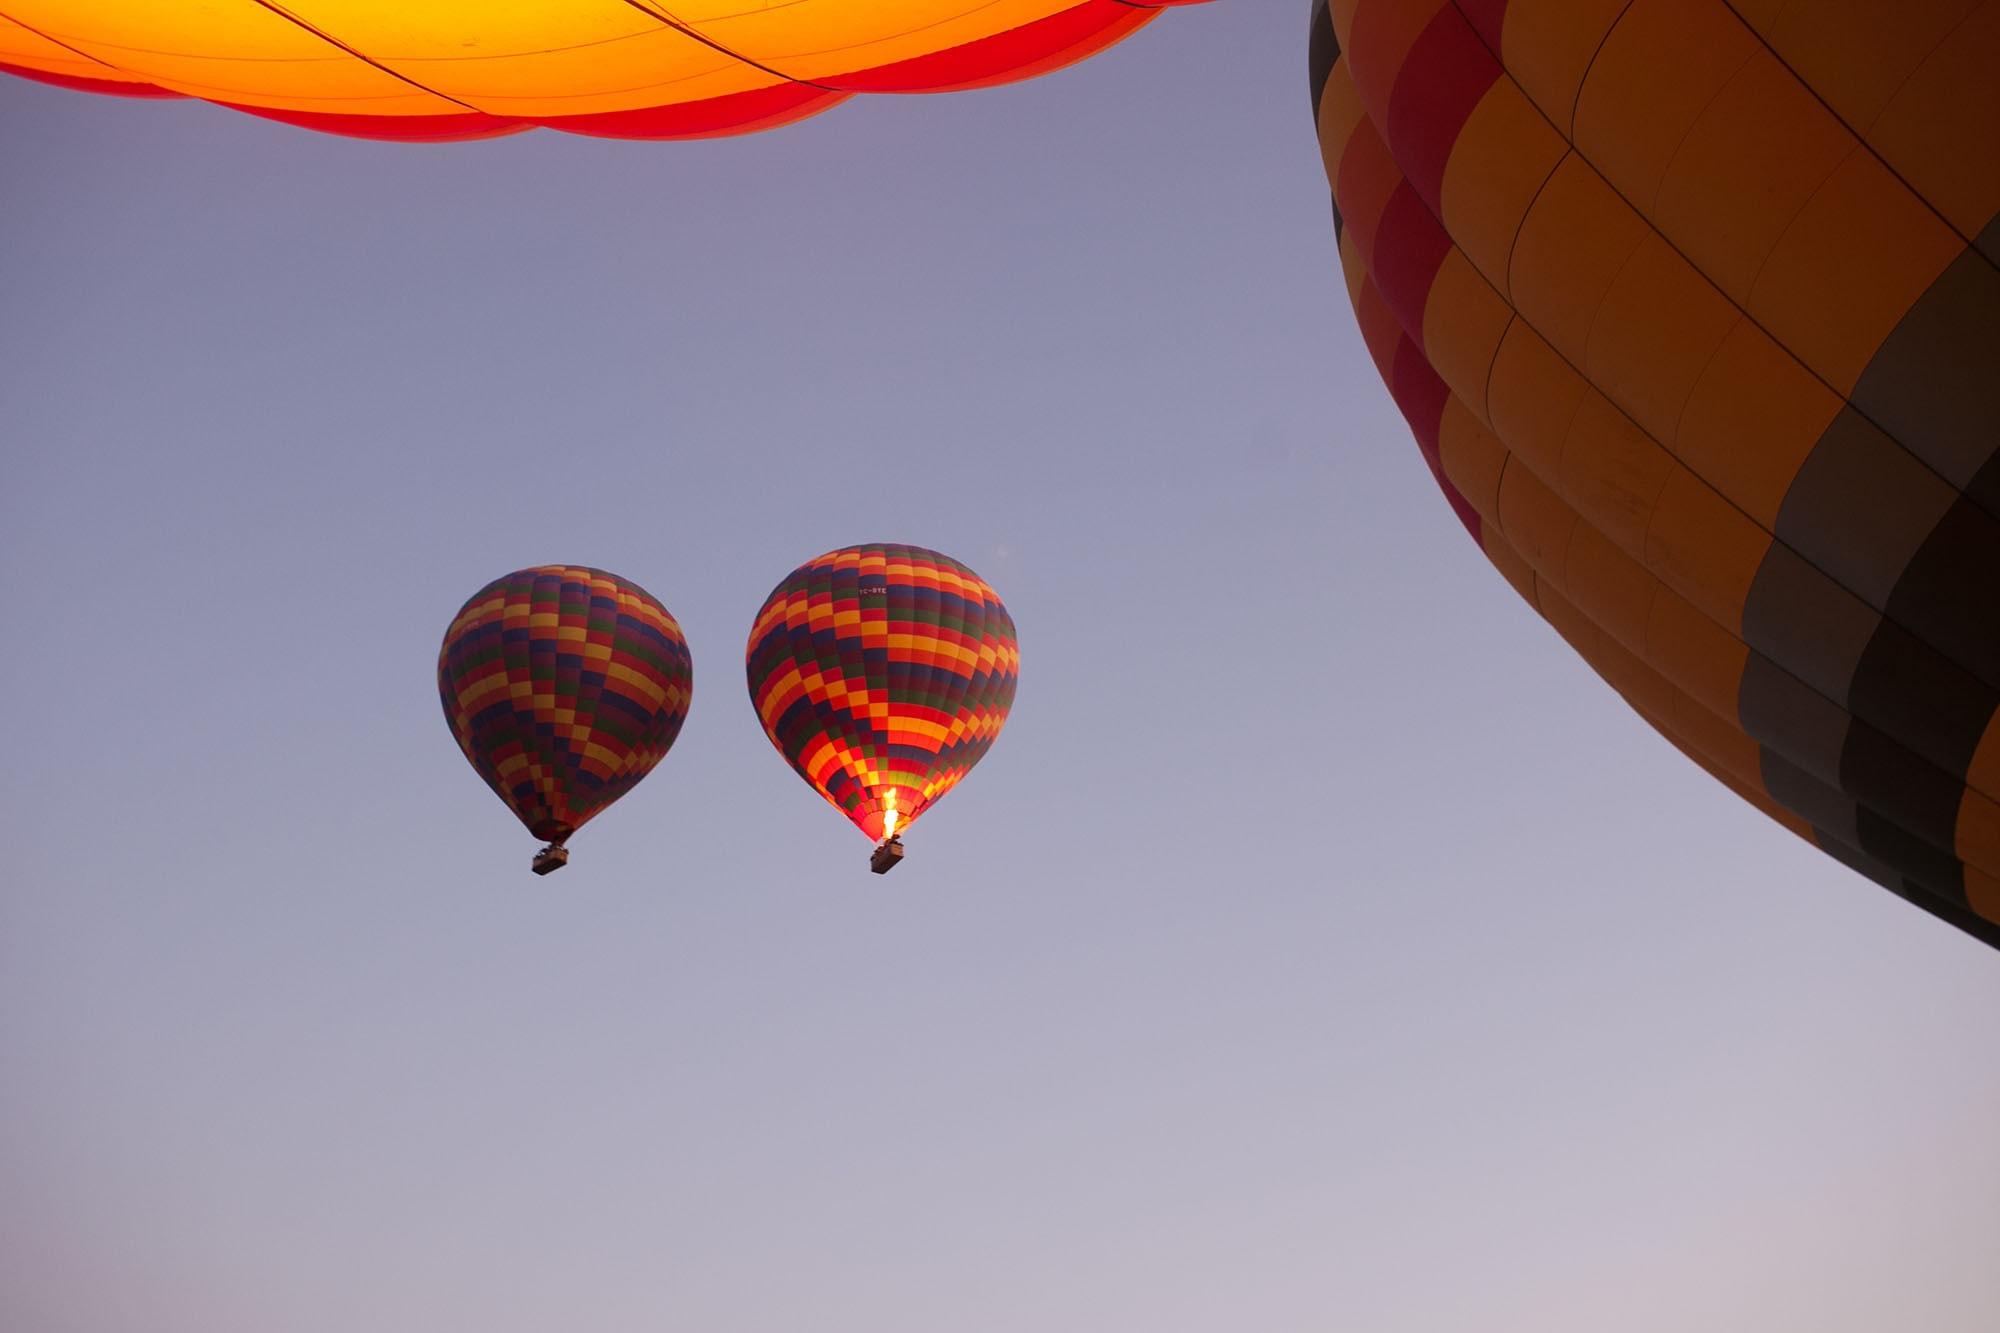 Ride on a hot air balloon - Hot air balloon ride in Cappadocia, Turkey